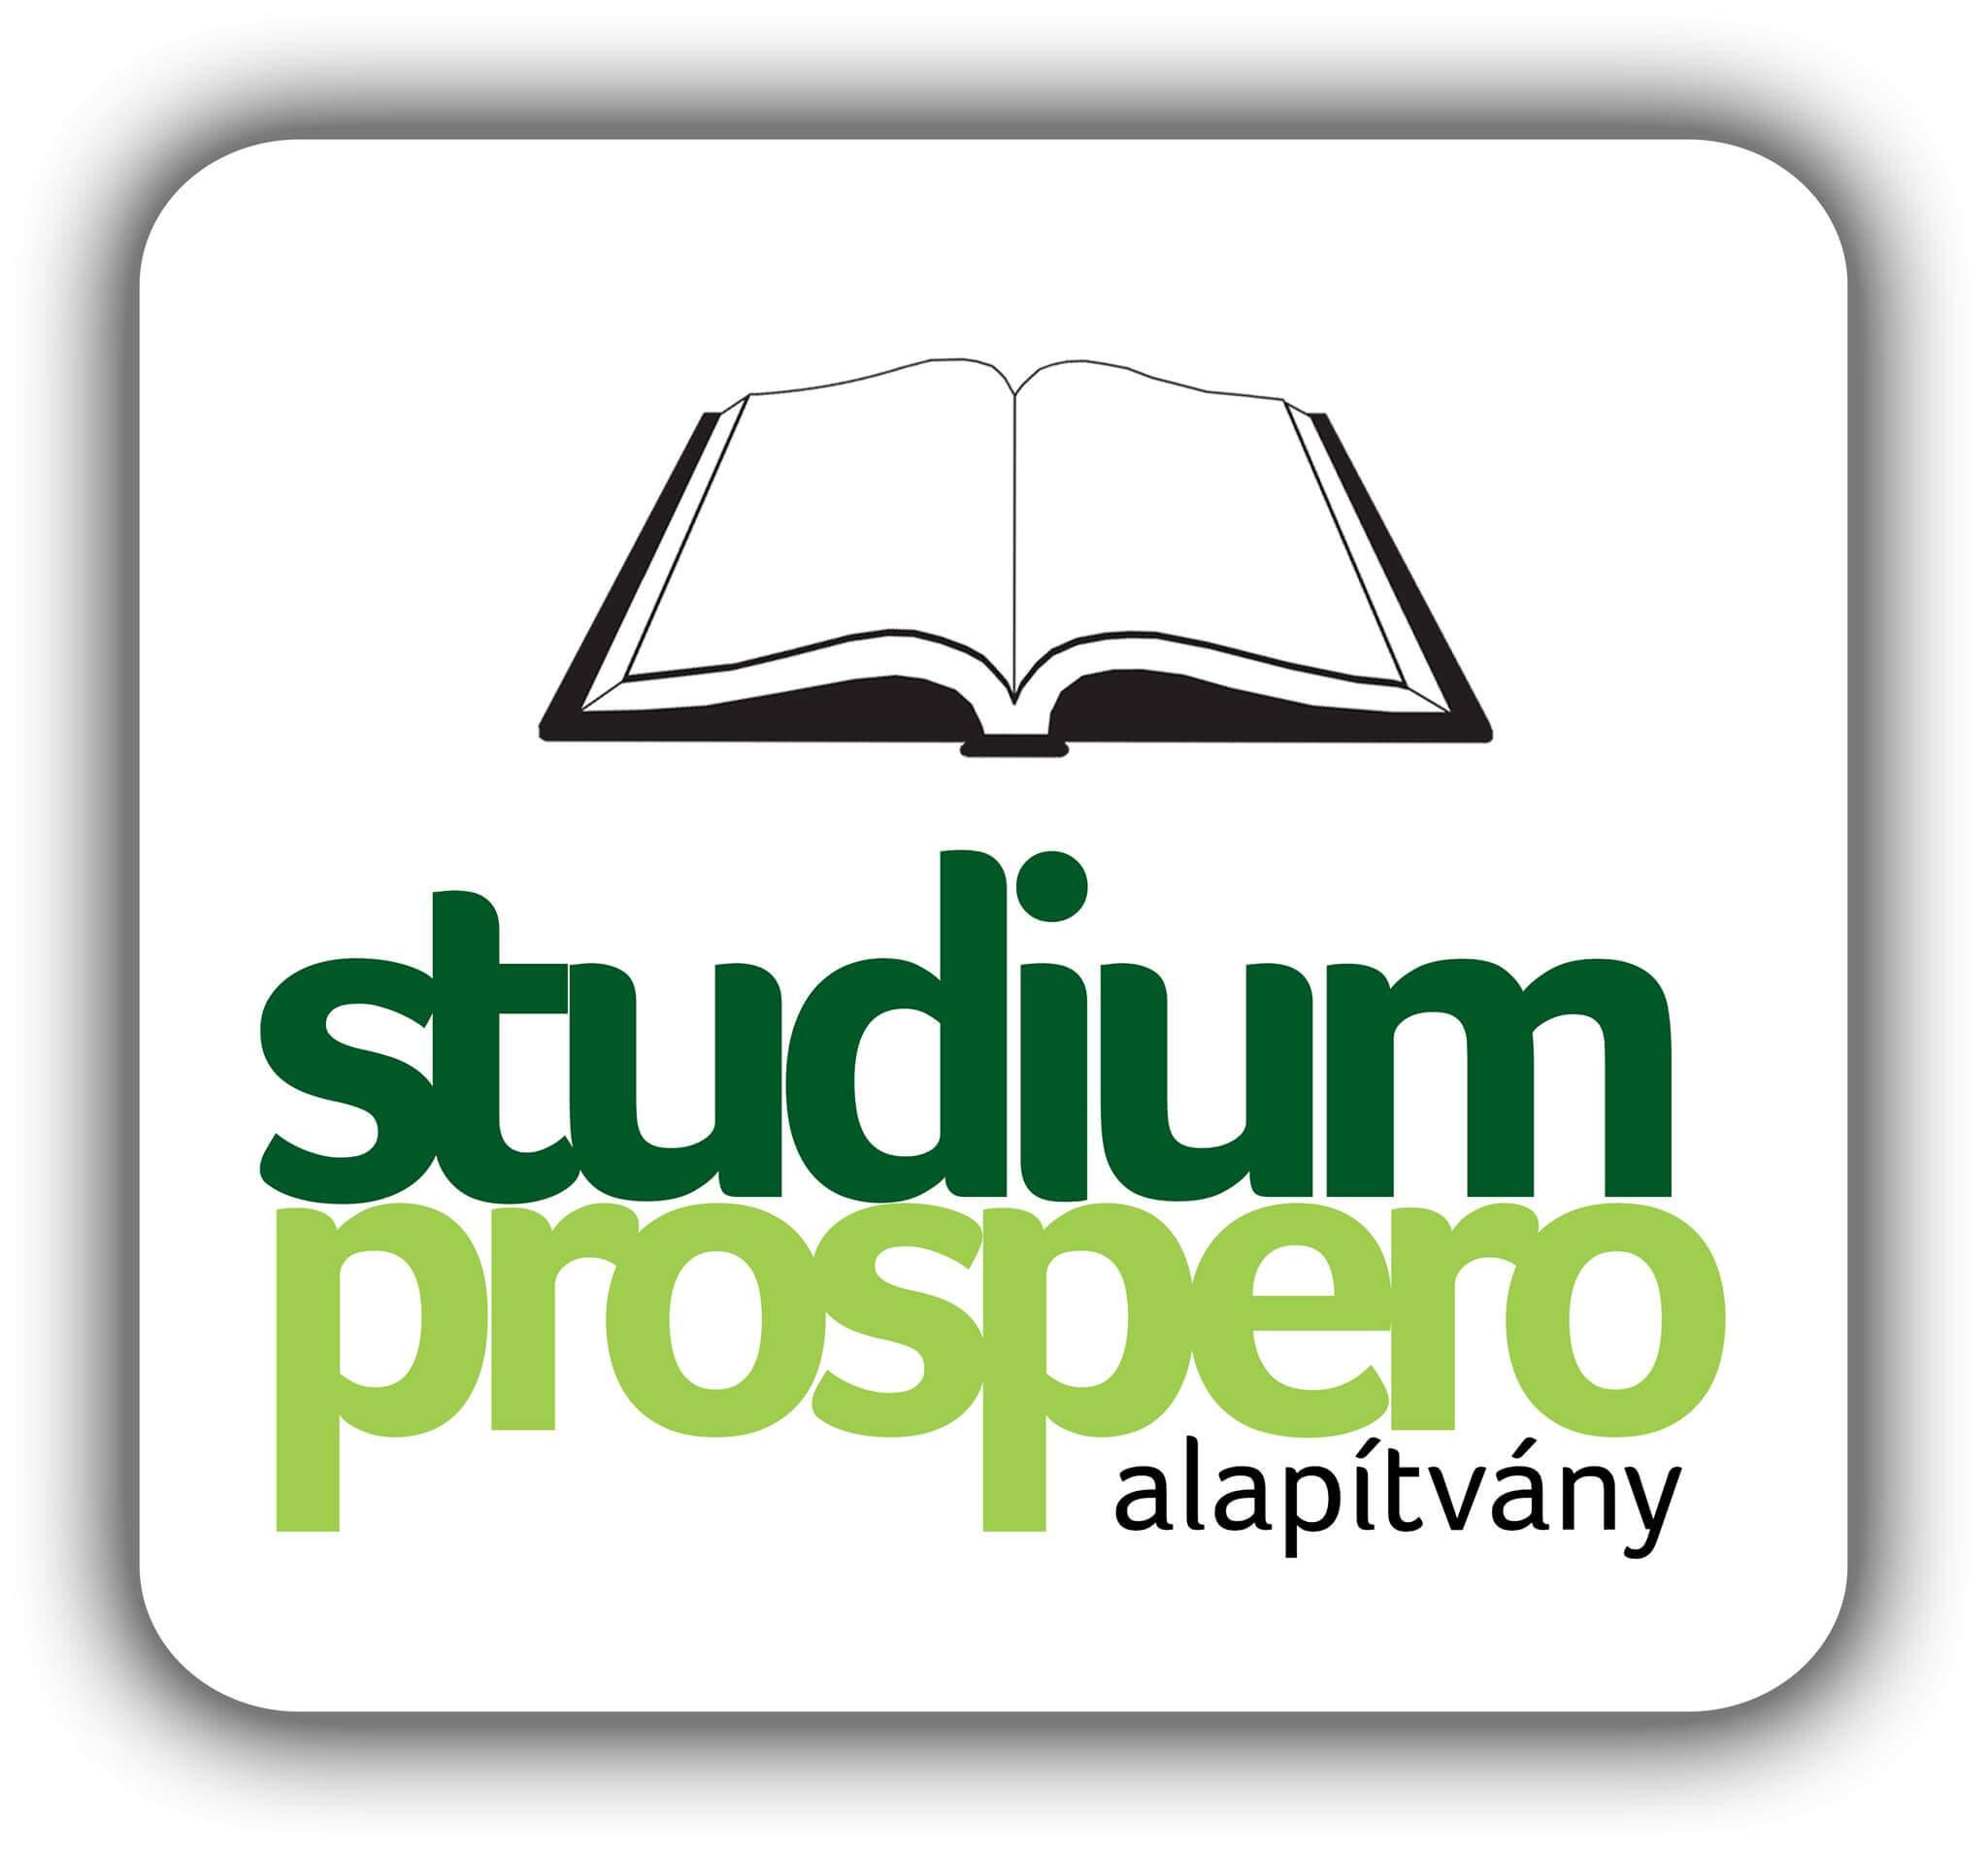 Studium-Prospero Alapítvány